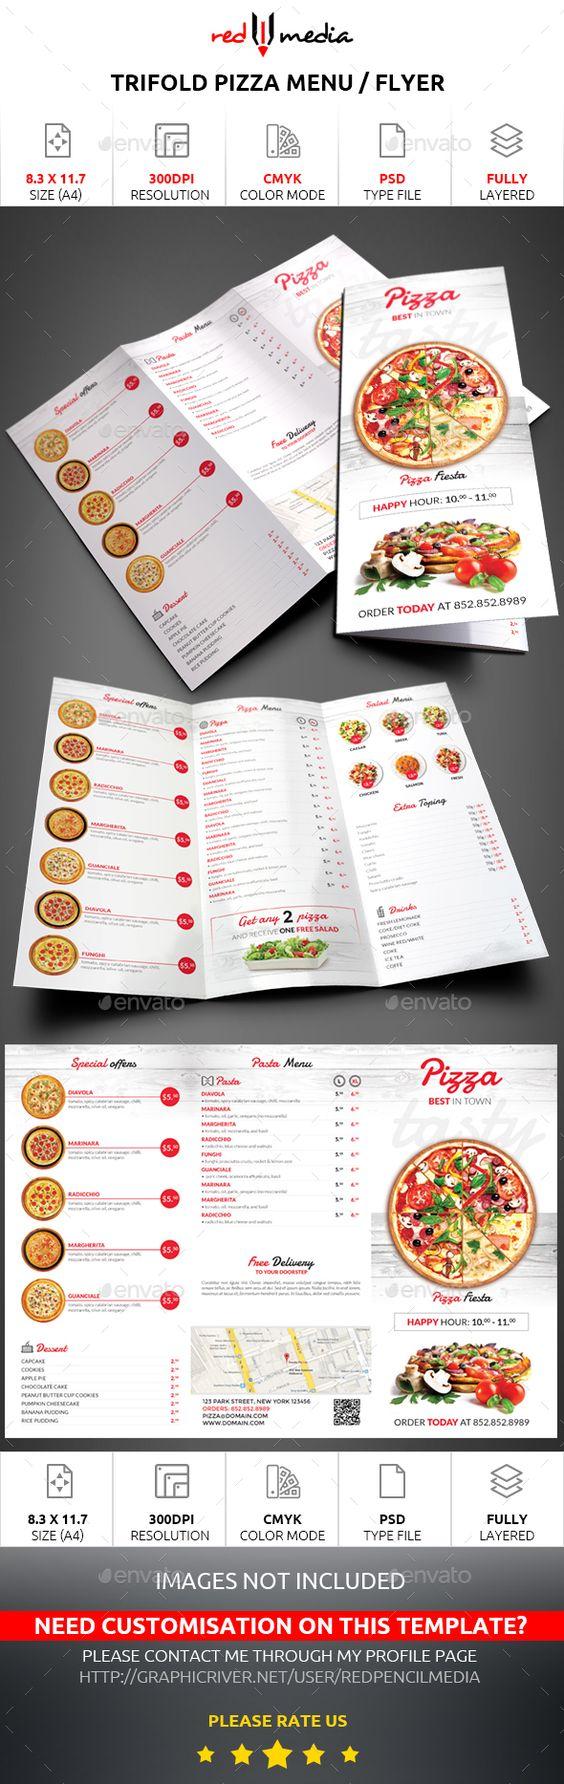 #Trifold #Pizza Menu / Flyer - #Restaurant #Flyers Download here: https://graphicriver.net/item/trifold-pizza-menu-flyer/15763178?ref=artgallery8